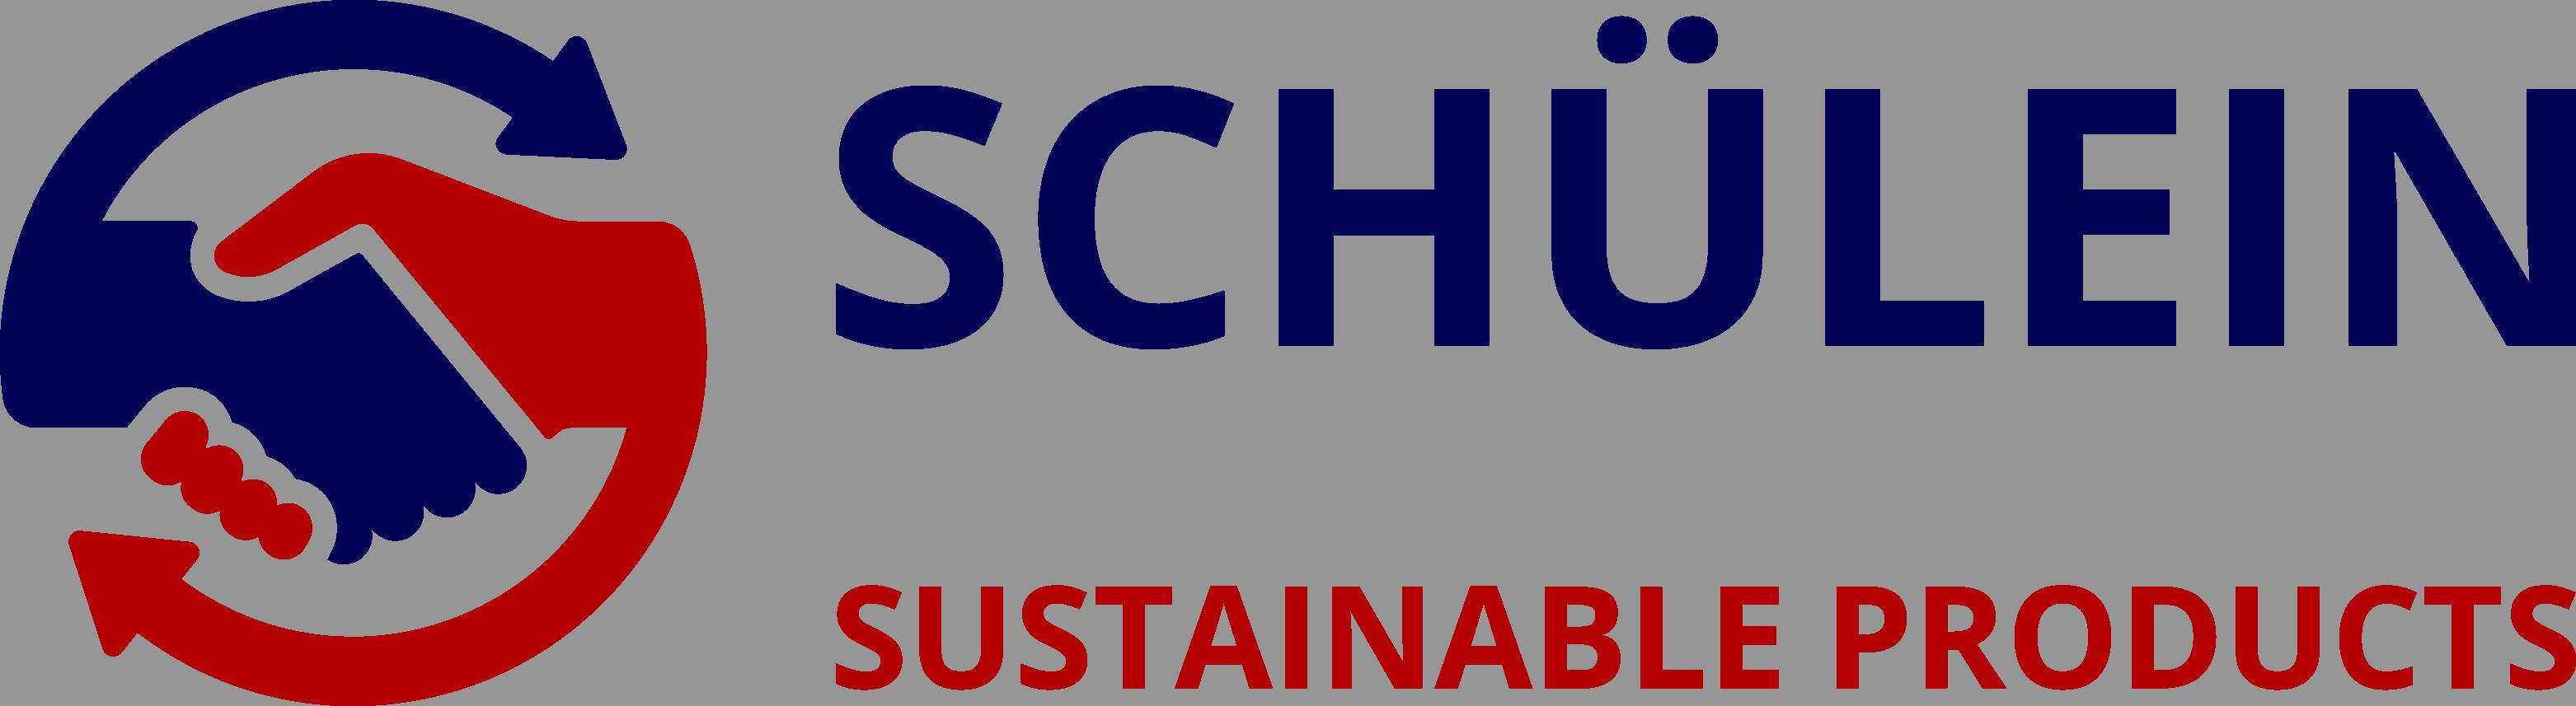 Sustainable Products Schuelein